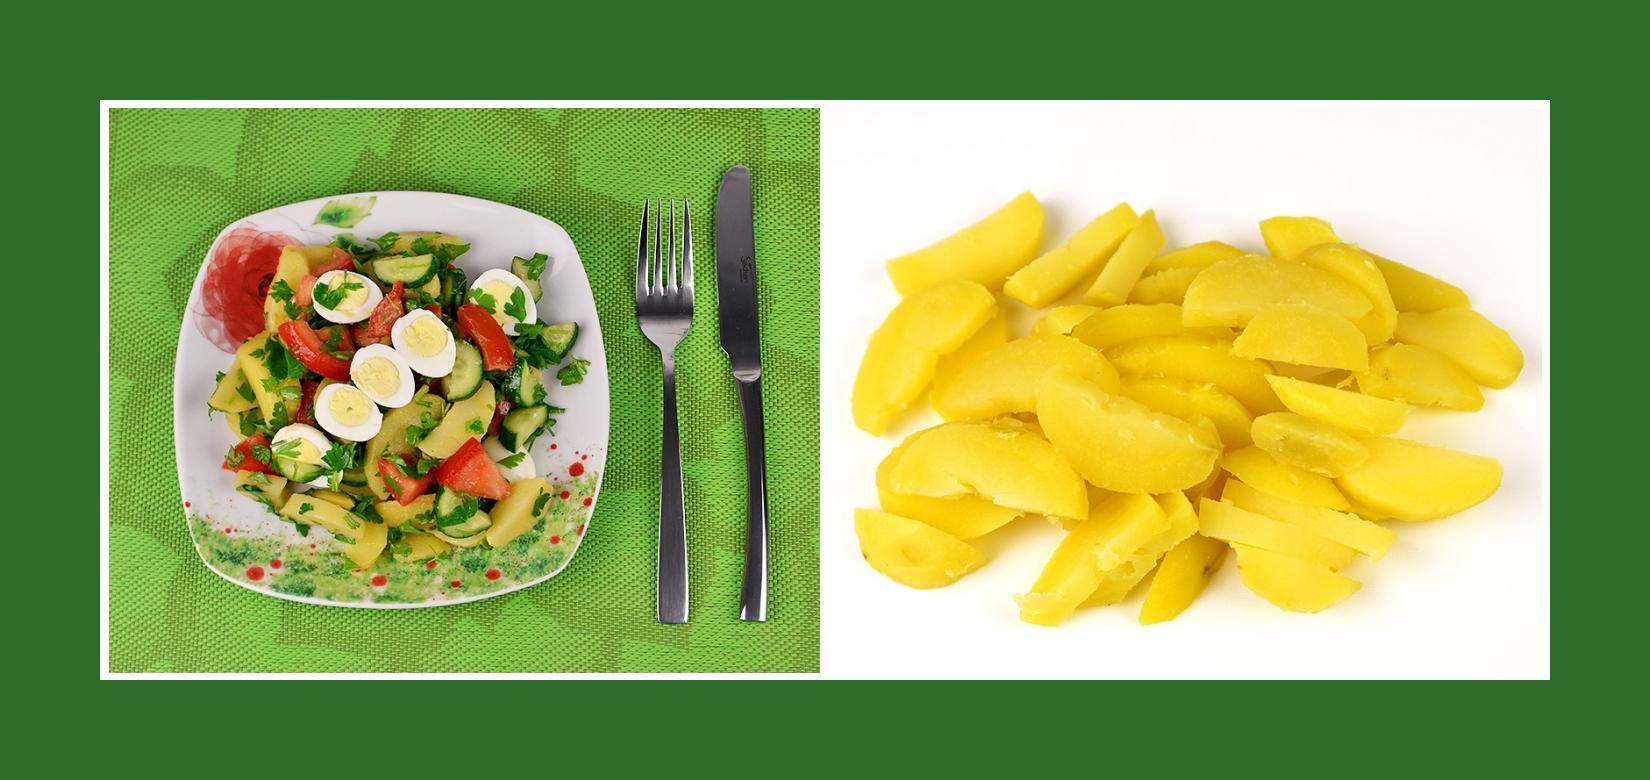 Salat mit Wachtelei und Kochkartoffeln